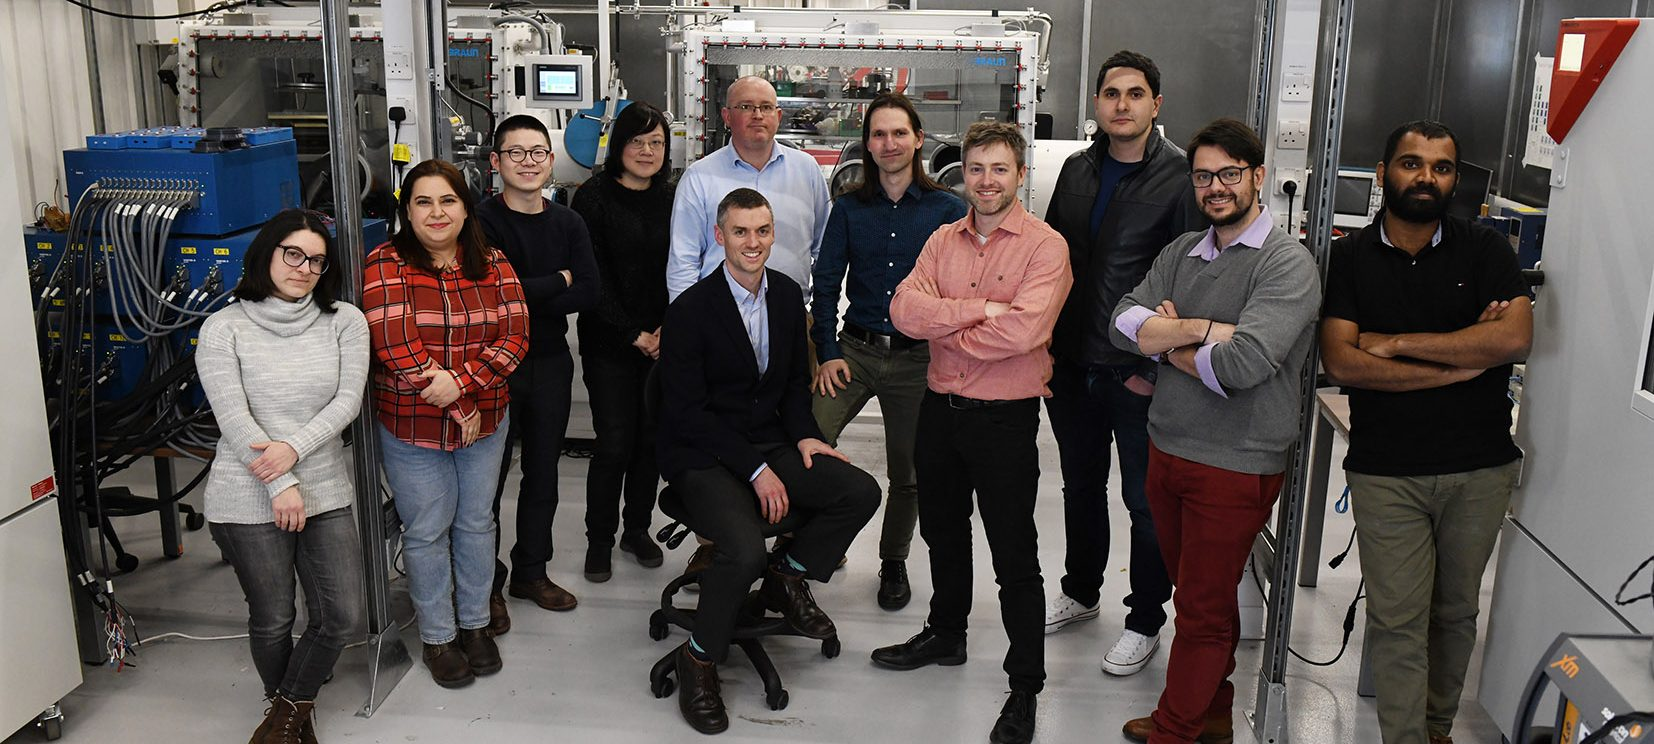 Simon Shepherd (centre) with the C-ALPS team.